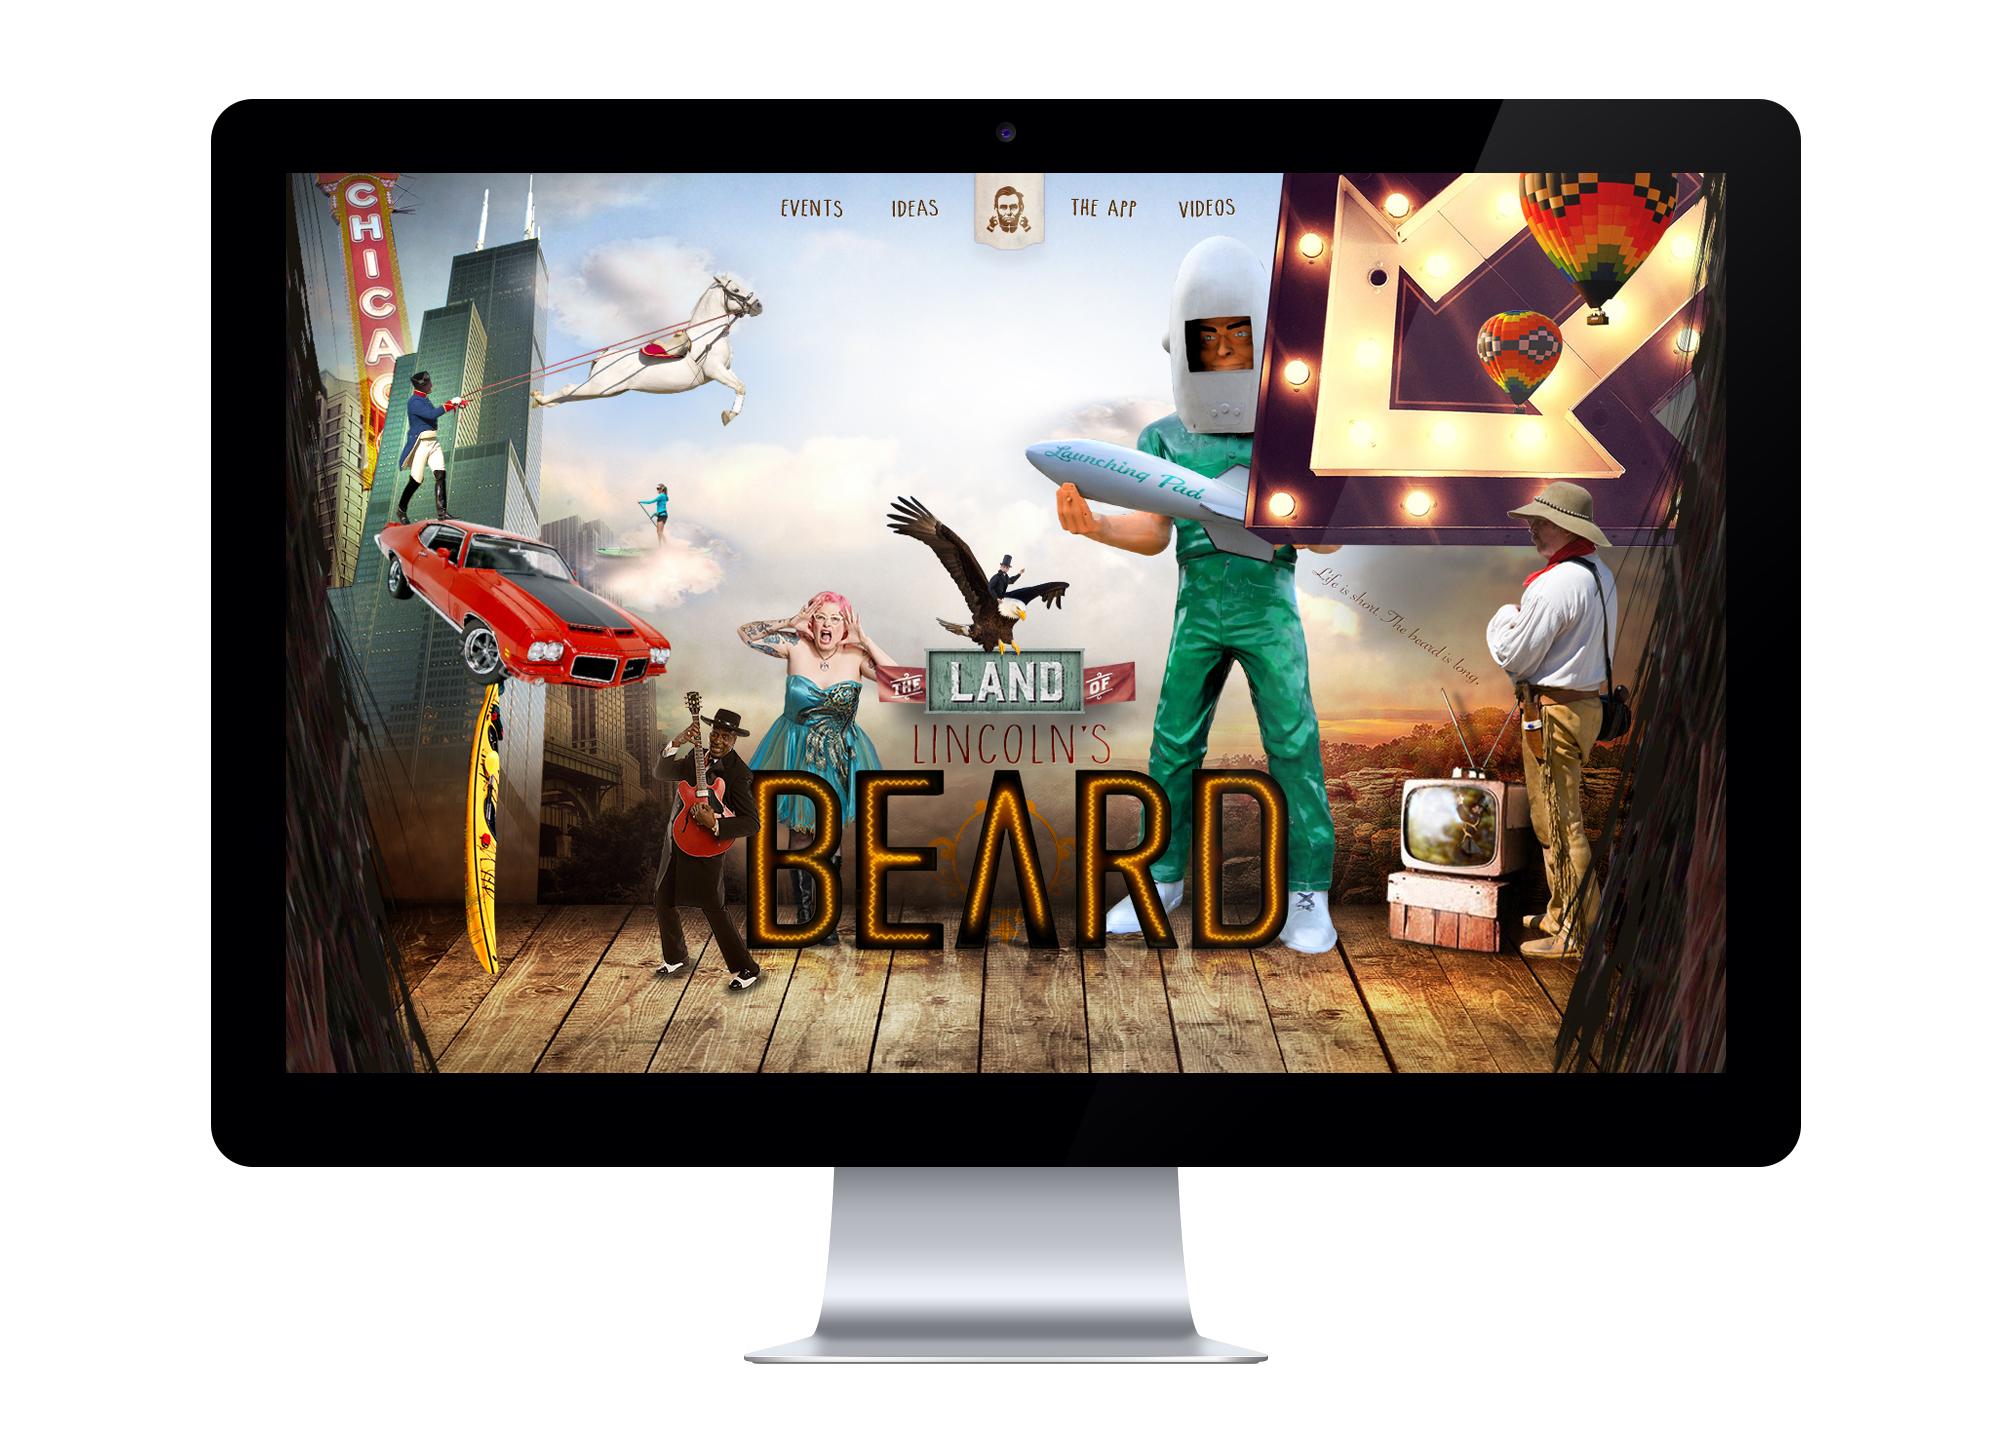 Monitor_beard_microsite-2.jpg